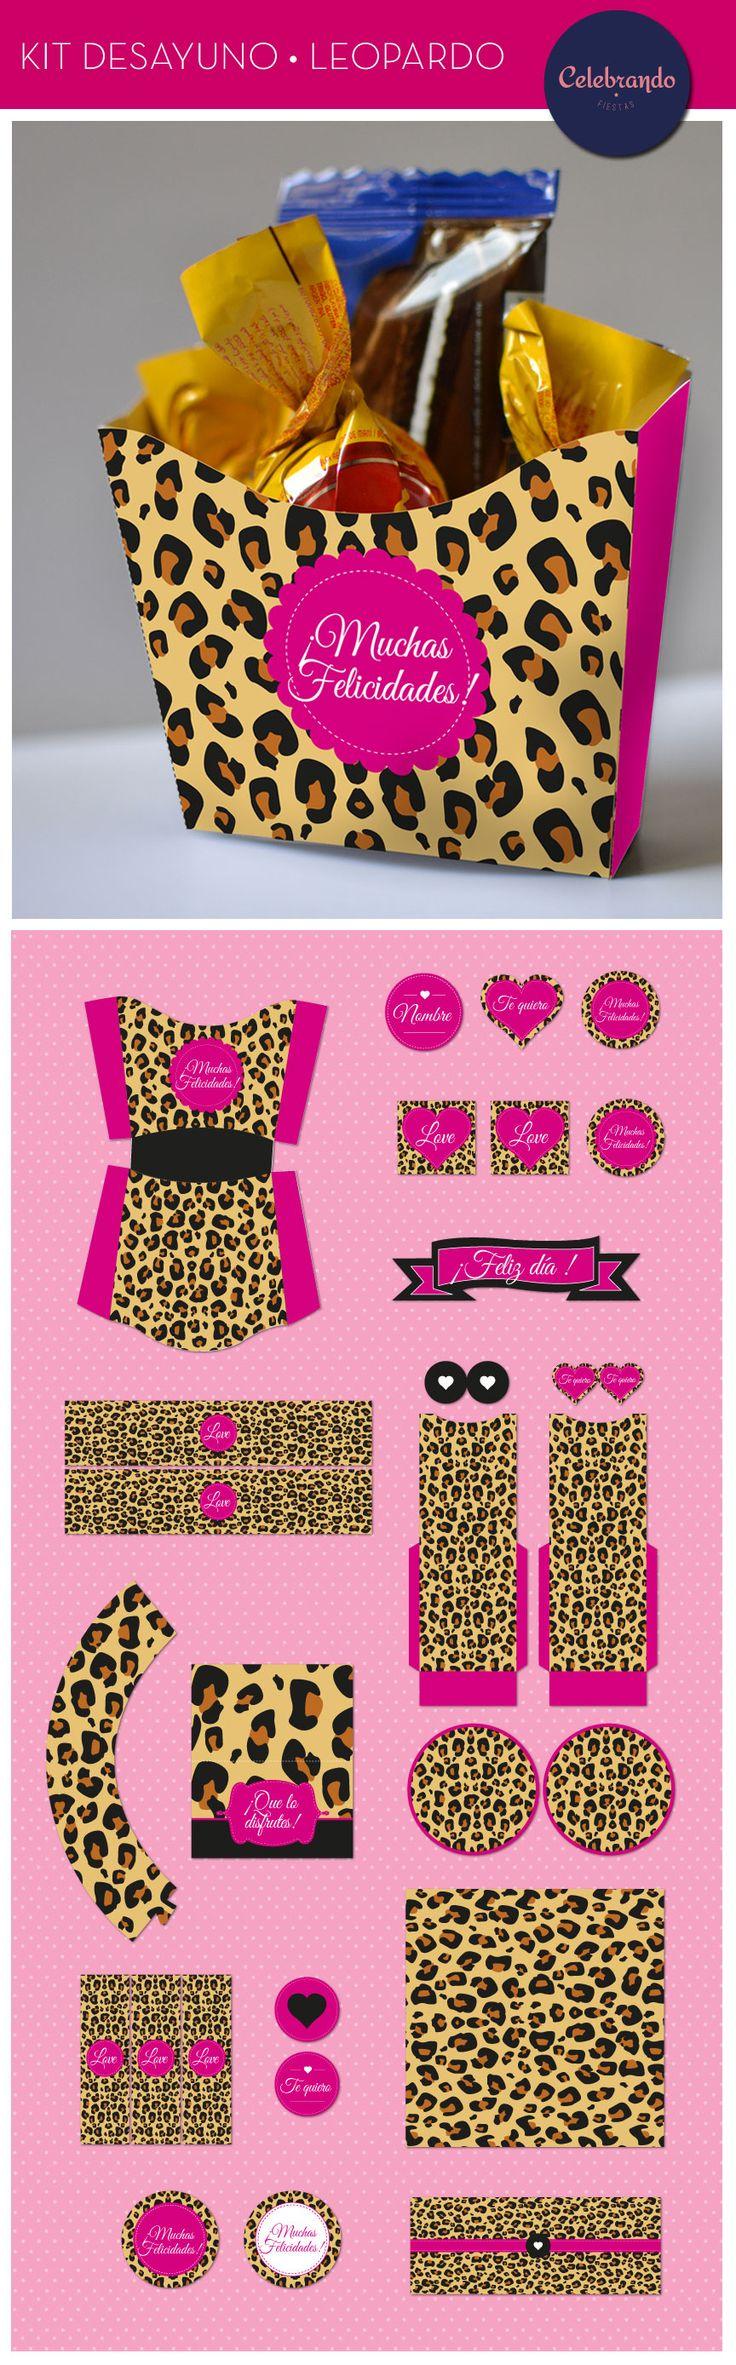 Kit imprimible desayuno para adultos - Leopardo. Celebrando Fiestas.